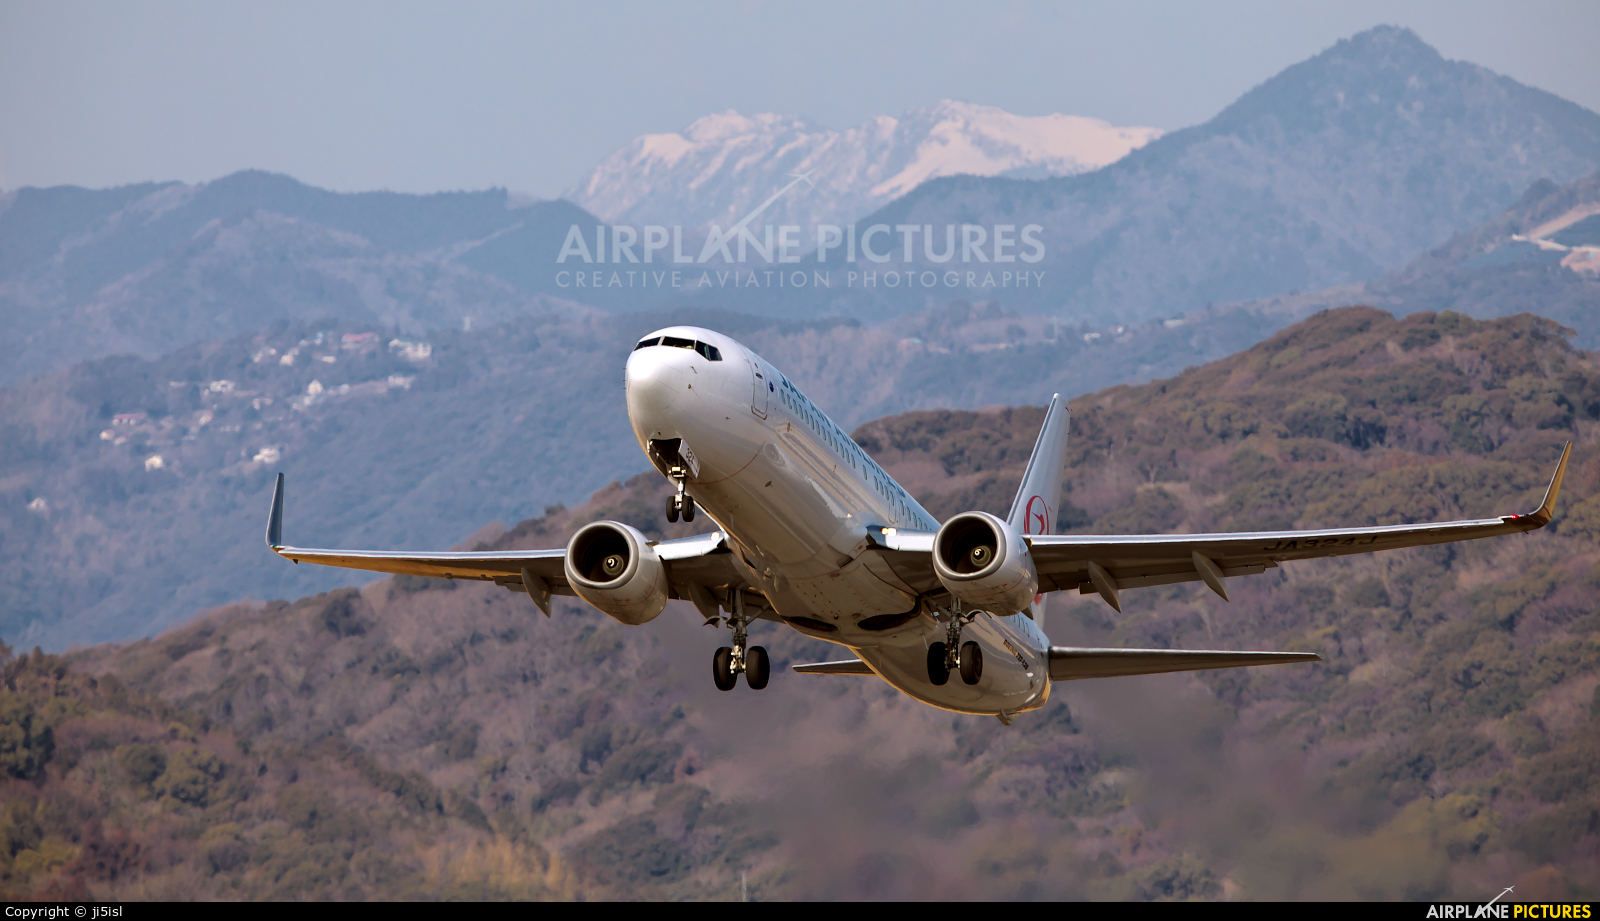 JAL - Japan Airlines JA324J aircraft at Kōchi